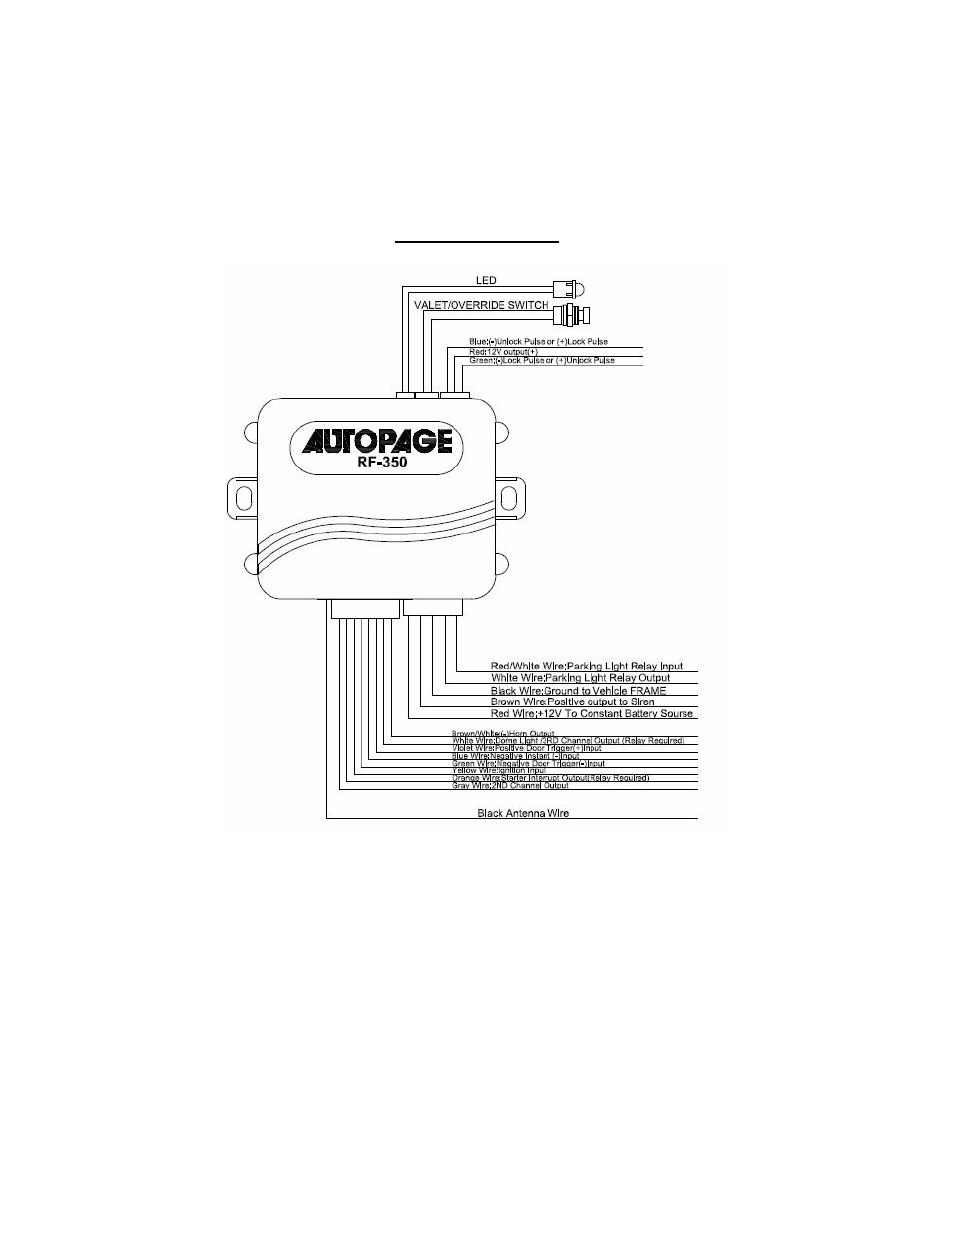 hight resolution of autopage wiring diagram wiring diagram dat autopage rf 220 wiring diagram autopage wiring diagram